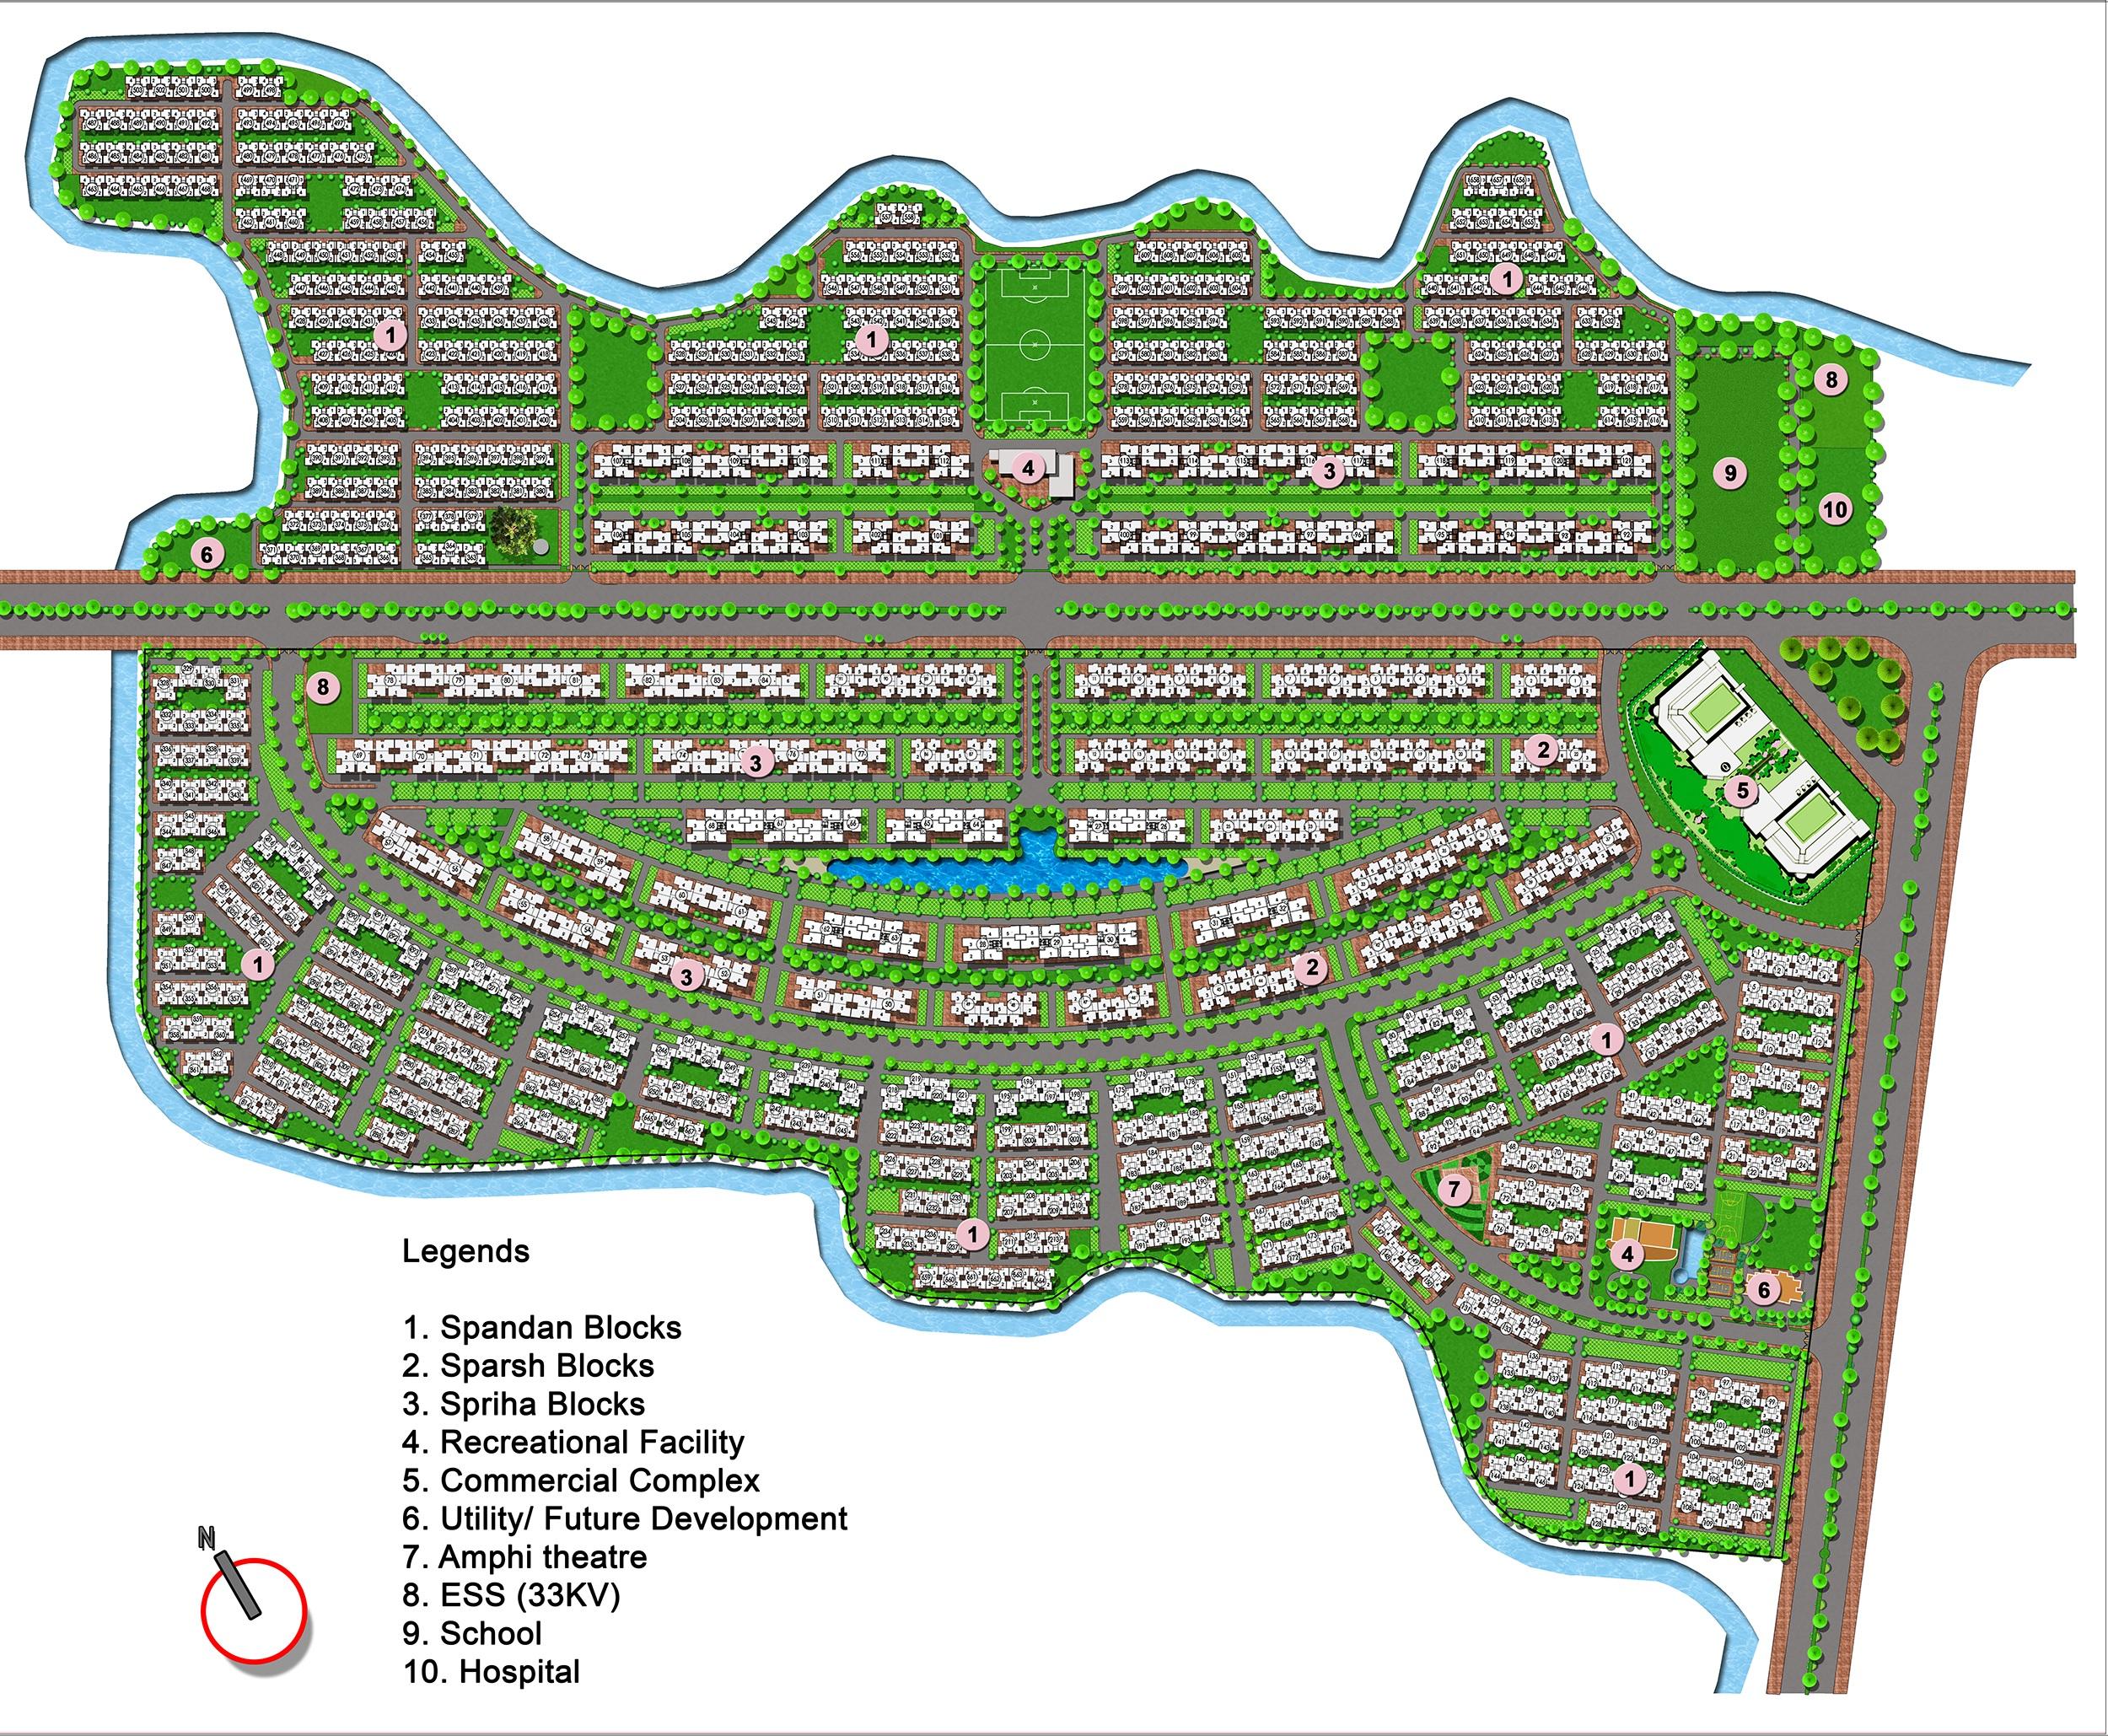 shapoorji pallonji shukho brishti project master plan image1